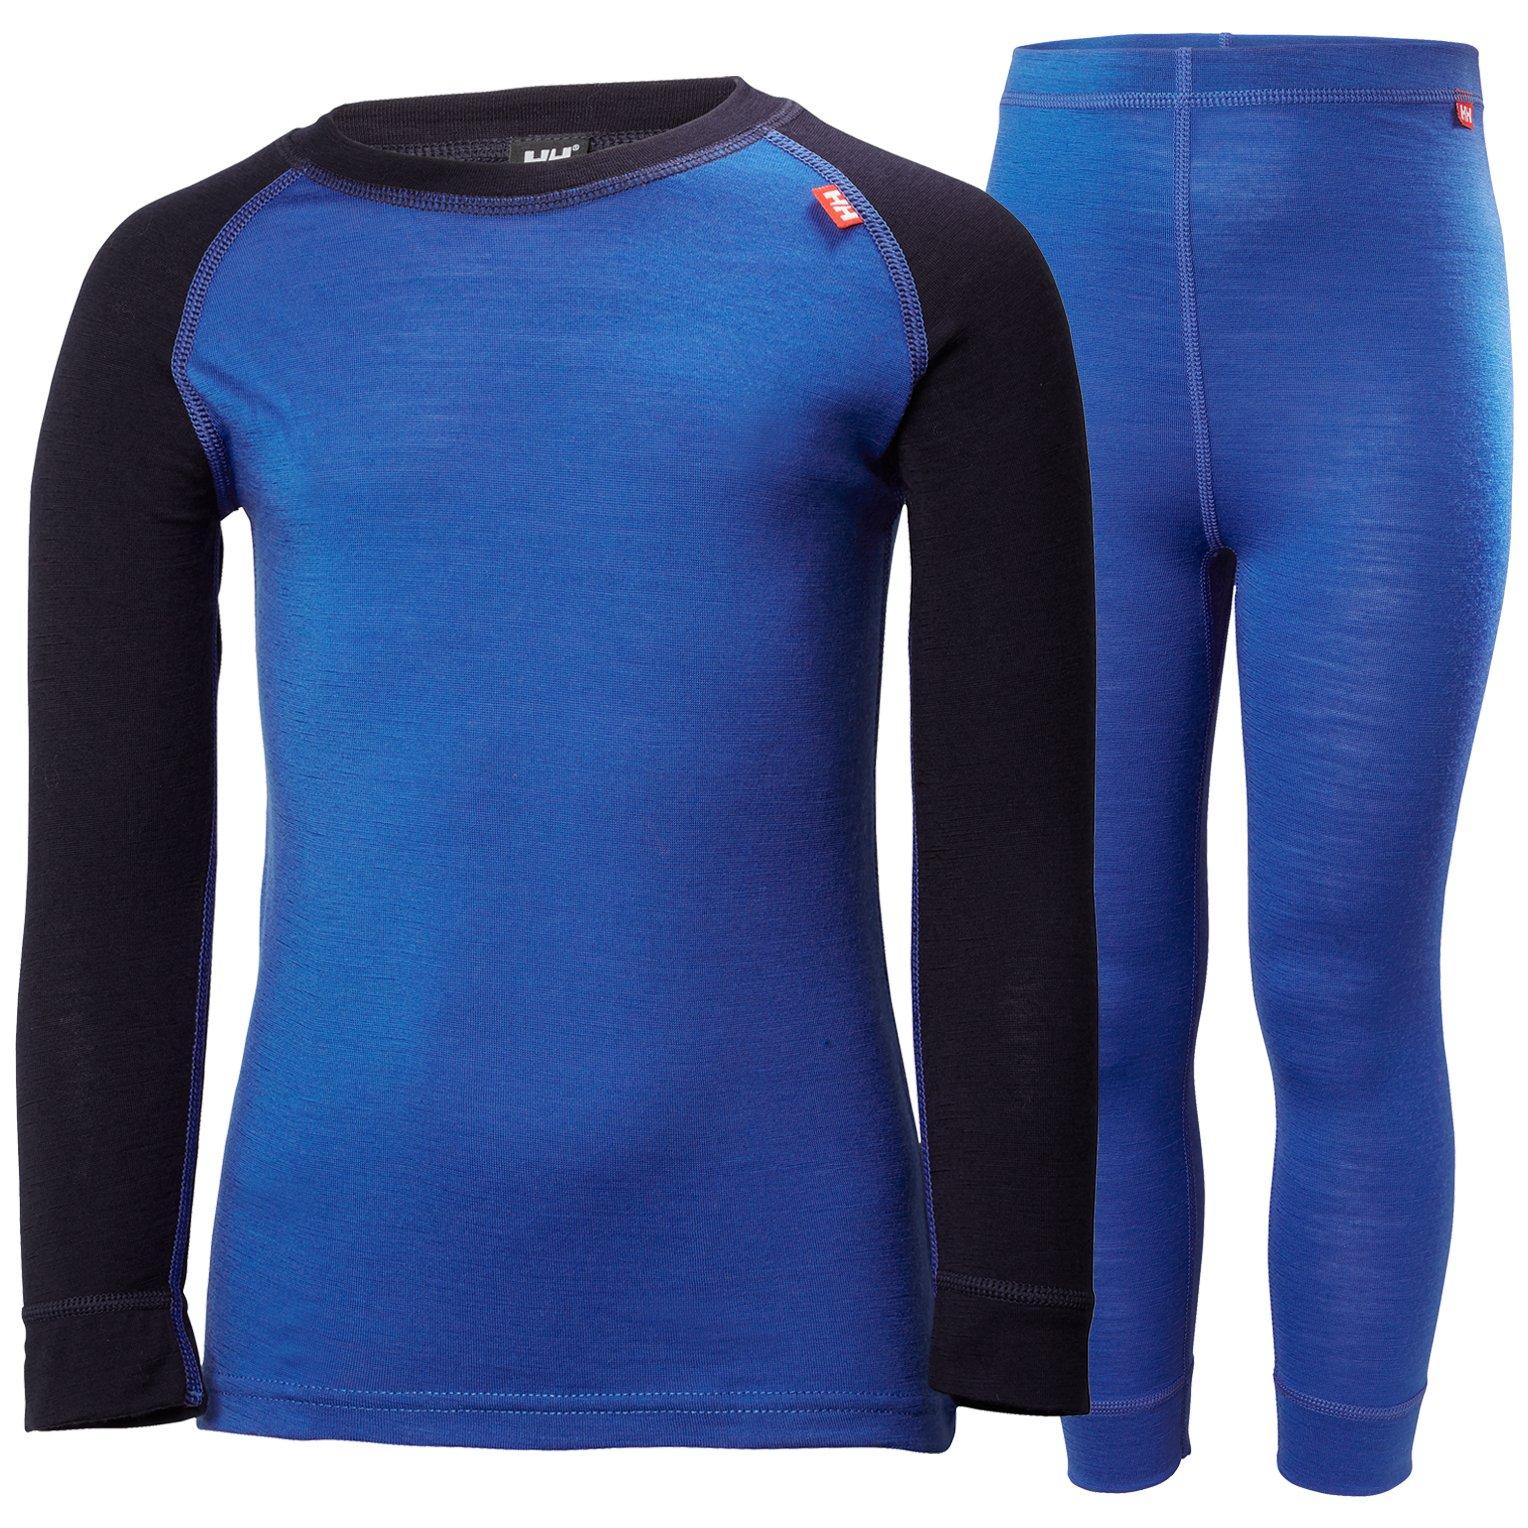 Helly Hansen K Merino Wool Mid Baselayer Set, Olympian Blue, Size 7